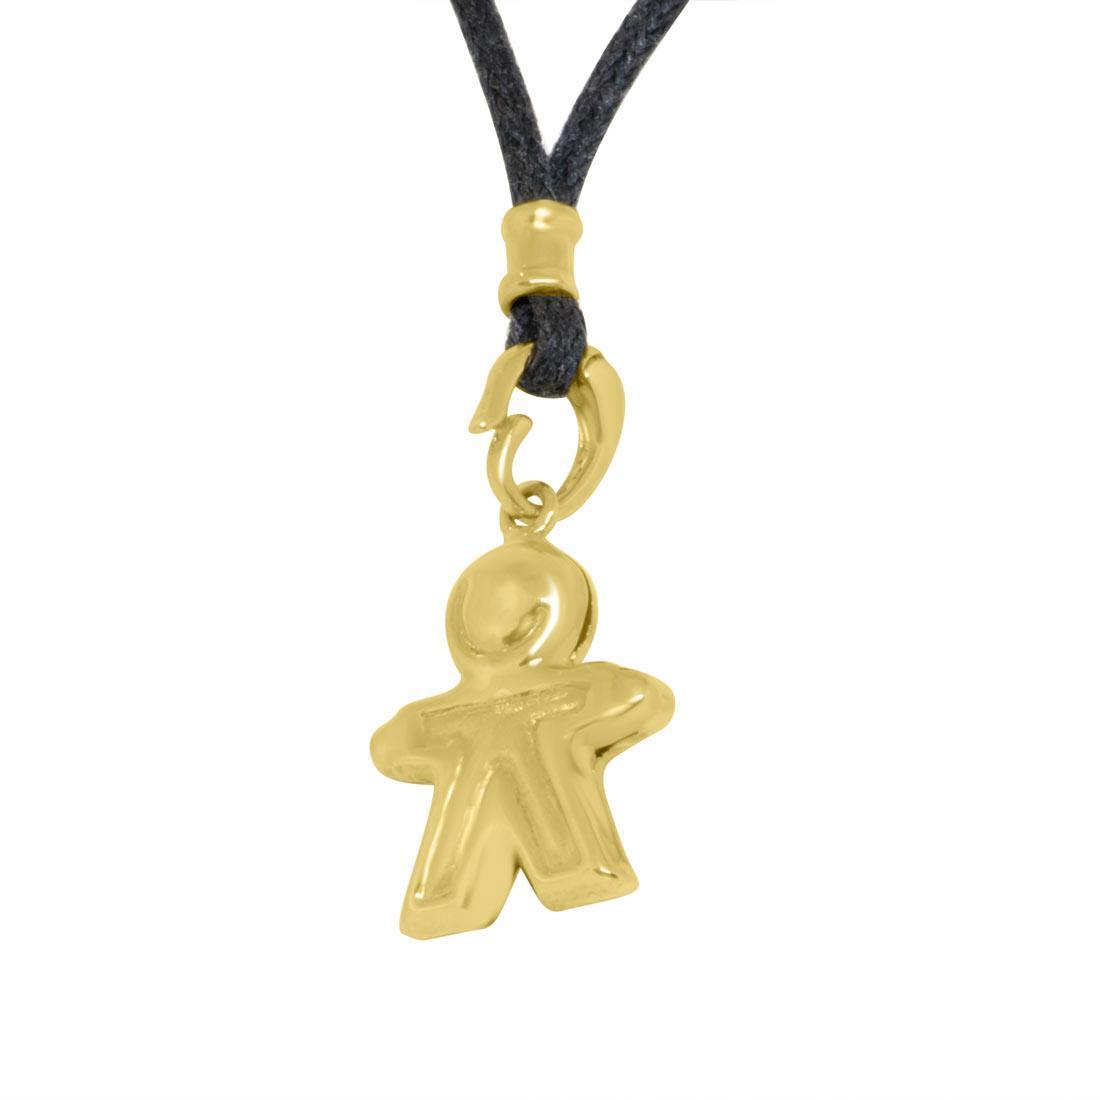 Collana con pendente in oro giallo - ALFIERI & ST.JOHN